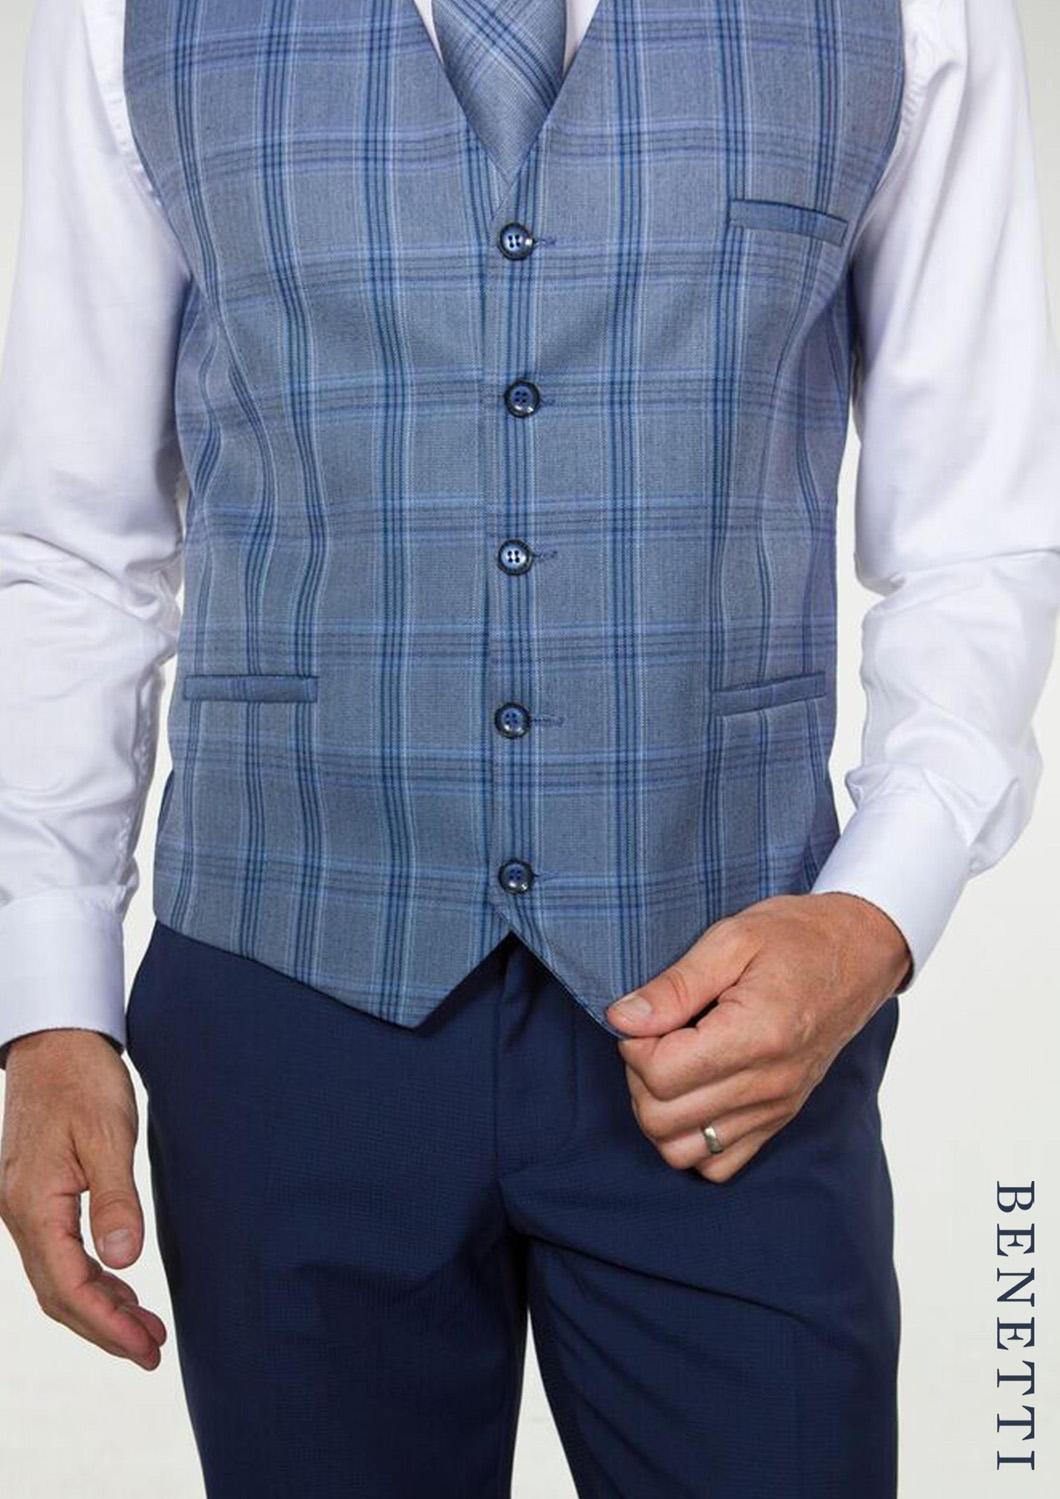 Hogan Petrol Blue Suit with Harold Waistcoat from Tom Murphy Menswear